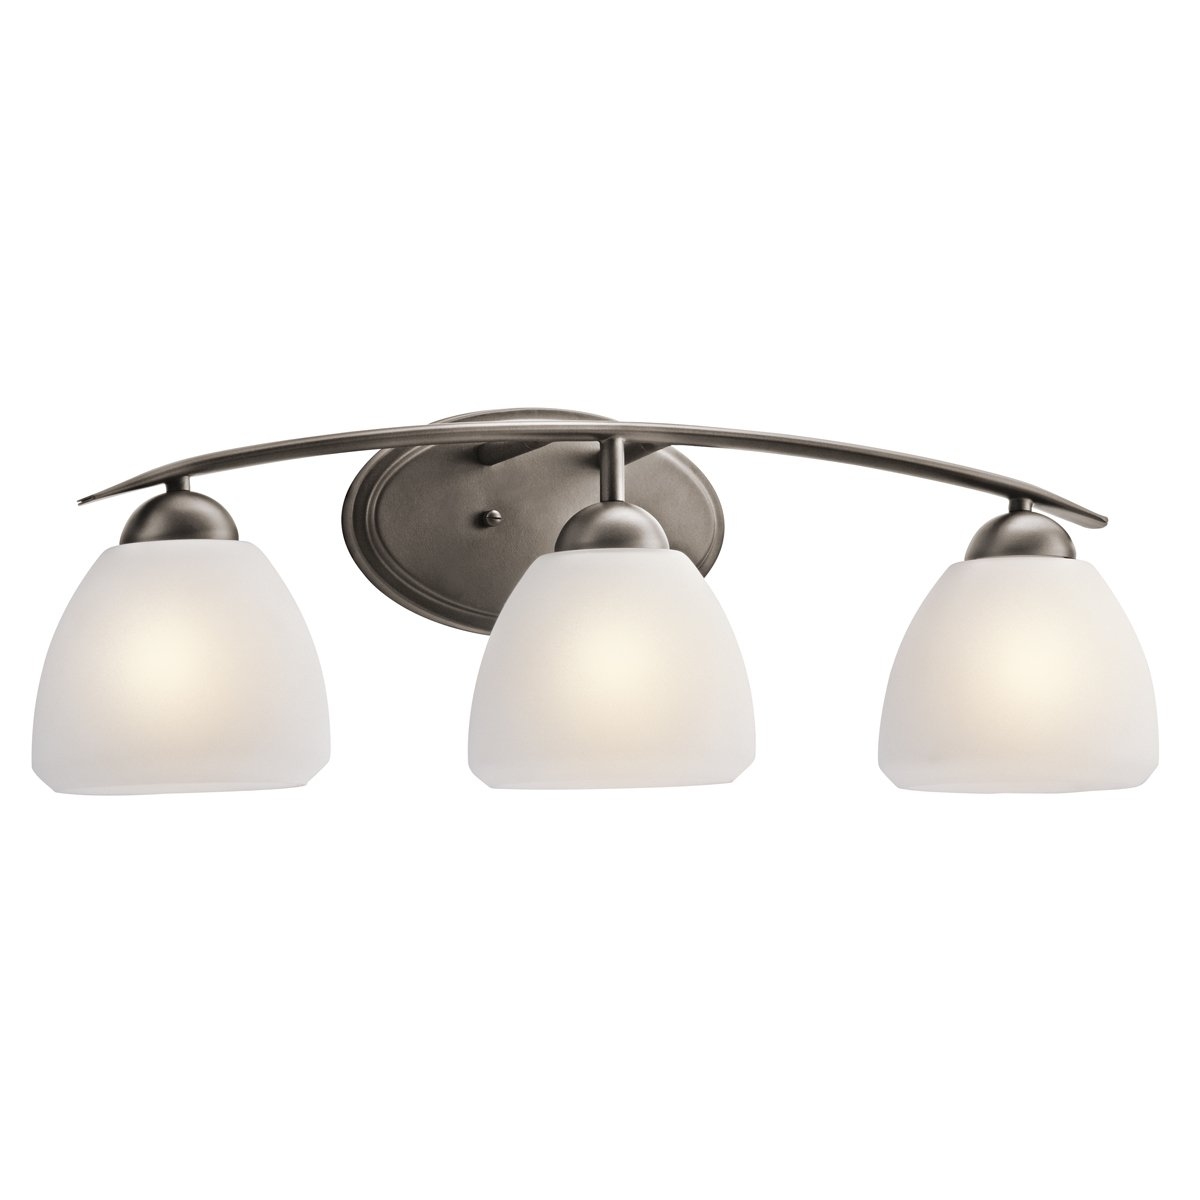 Calleigh 1lt壁取り付け用燭台 3 Light 45119OZ 1 B004SD9YCK 3 Light|オールドブロンズ オールドブロンズ 3 Light